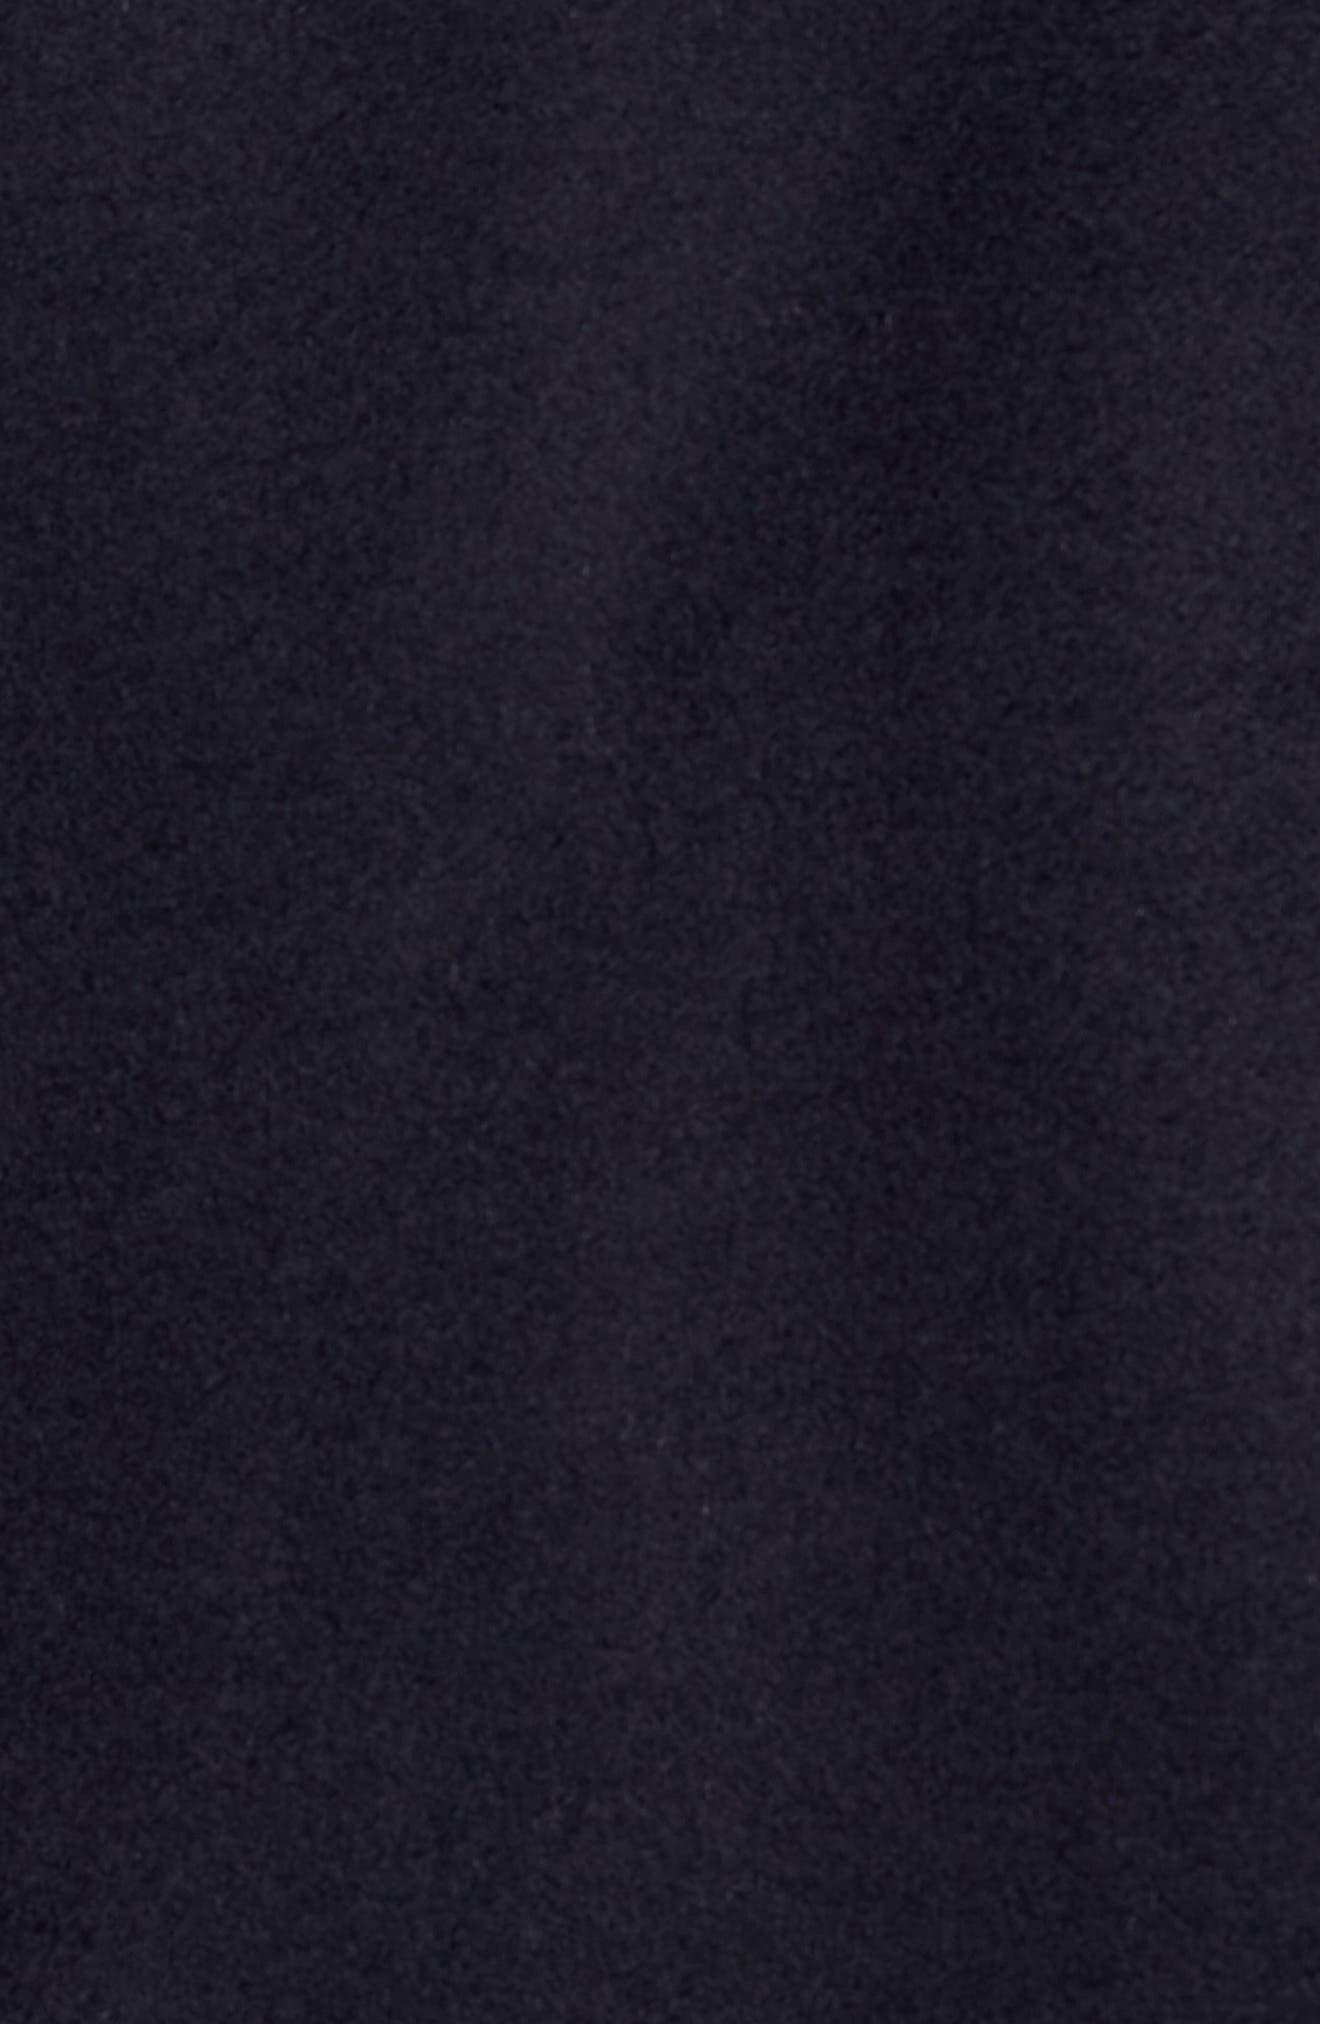 Westport Wool & Cashmere Jacket,                             Alternate thumbnail 18, color,